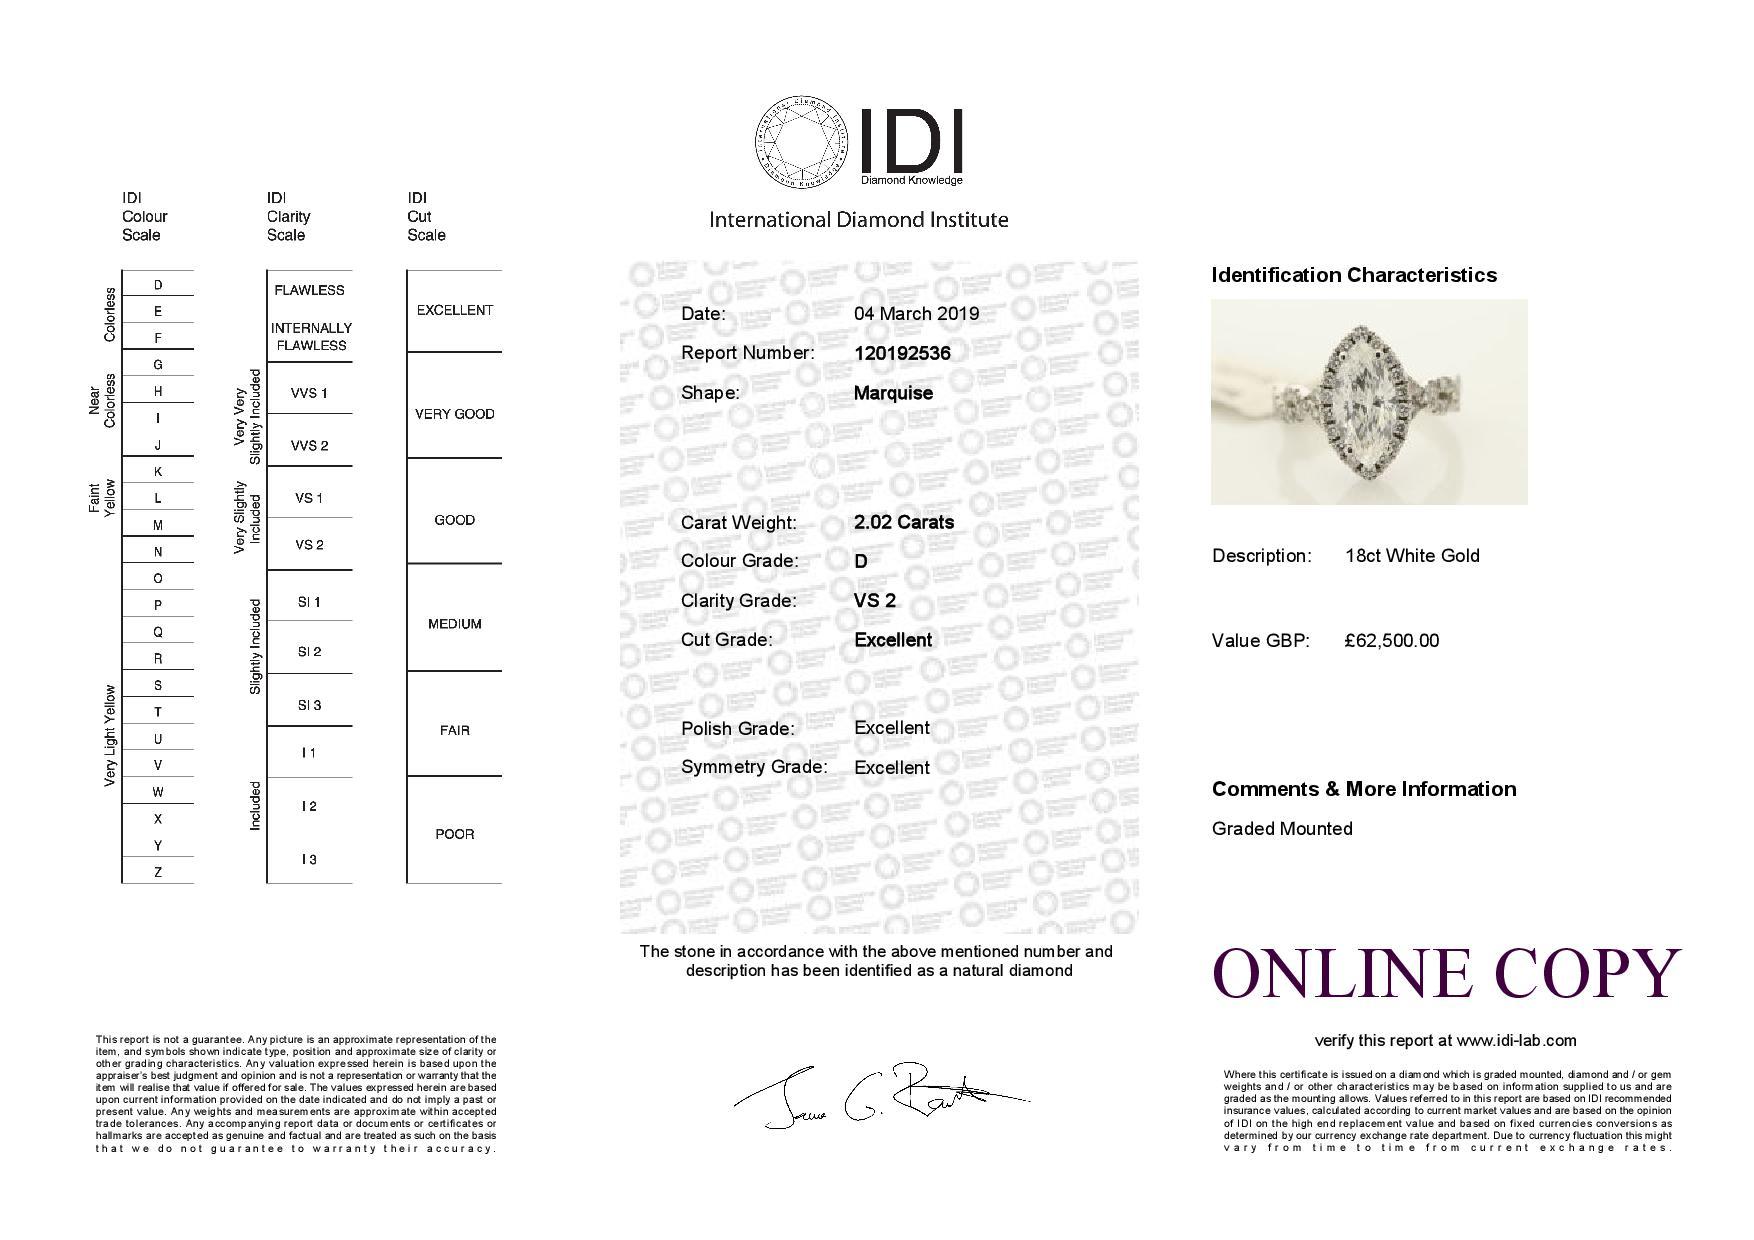 18k White Gold Single Stone With Halo Setting Ring 2.02 - Image 3 of 3